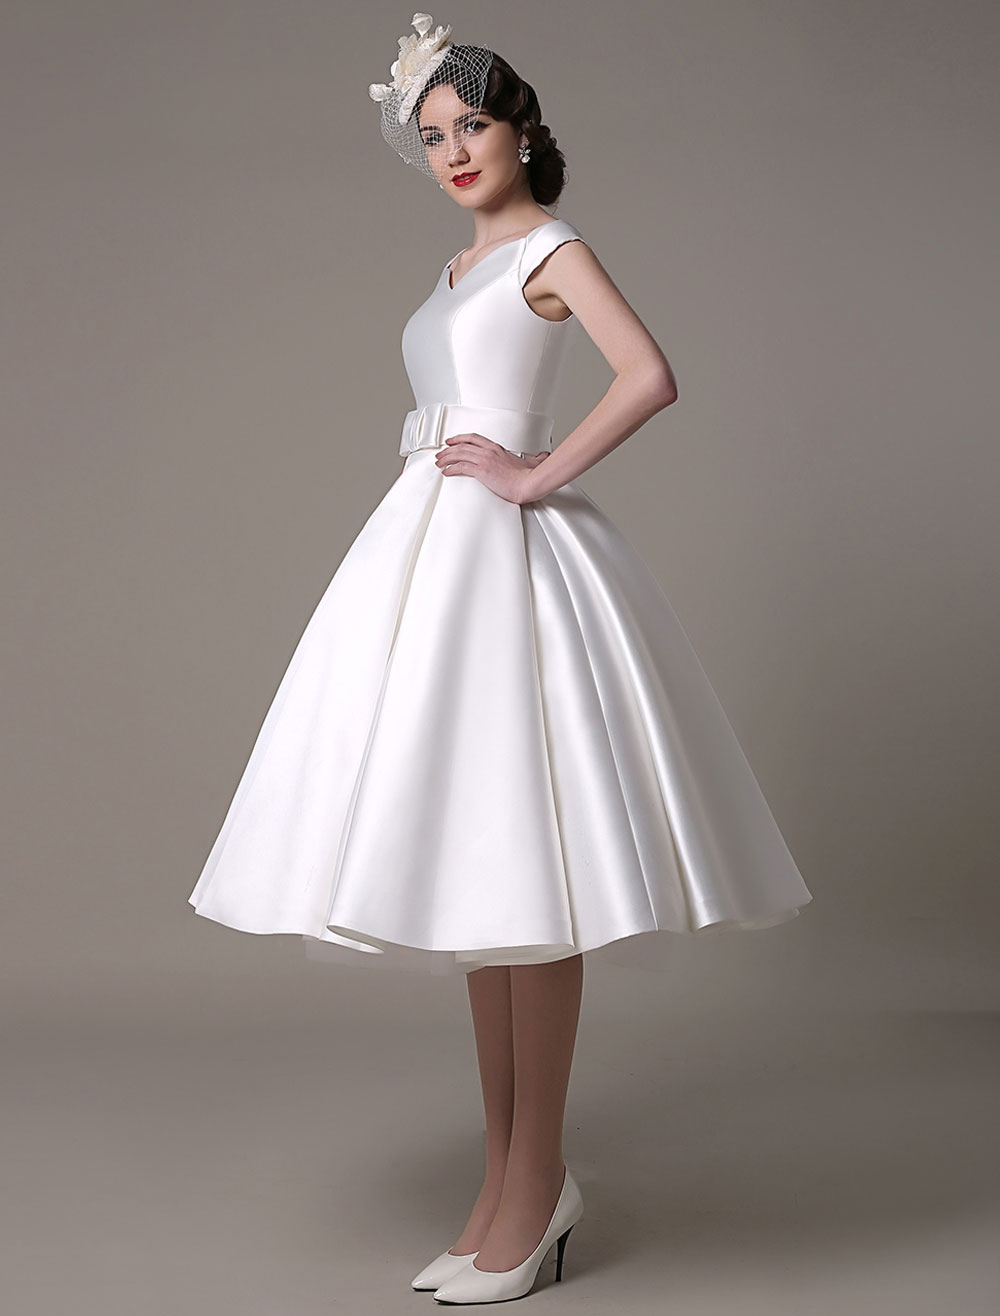 Ivory Wedding Dresses 2018 short satin Knee Length bow Sash retro bridal dress Milanoo (Short Wedding Dress) photo